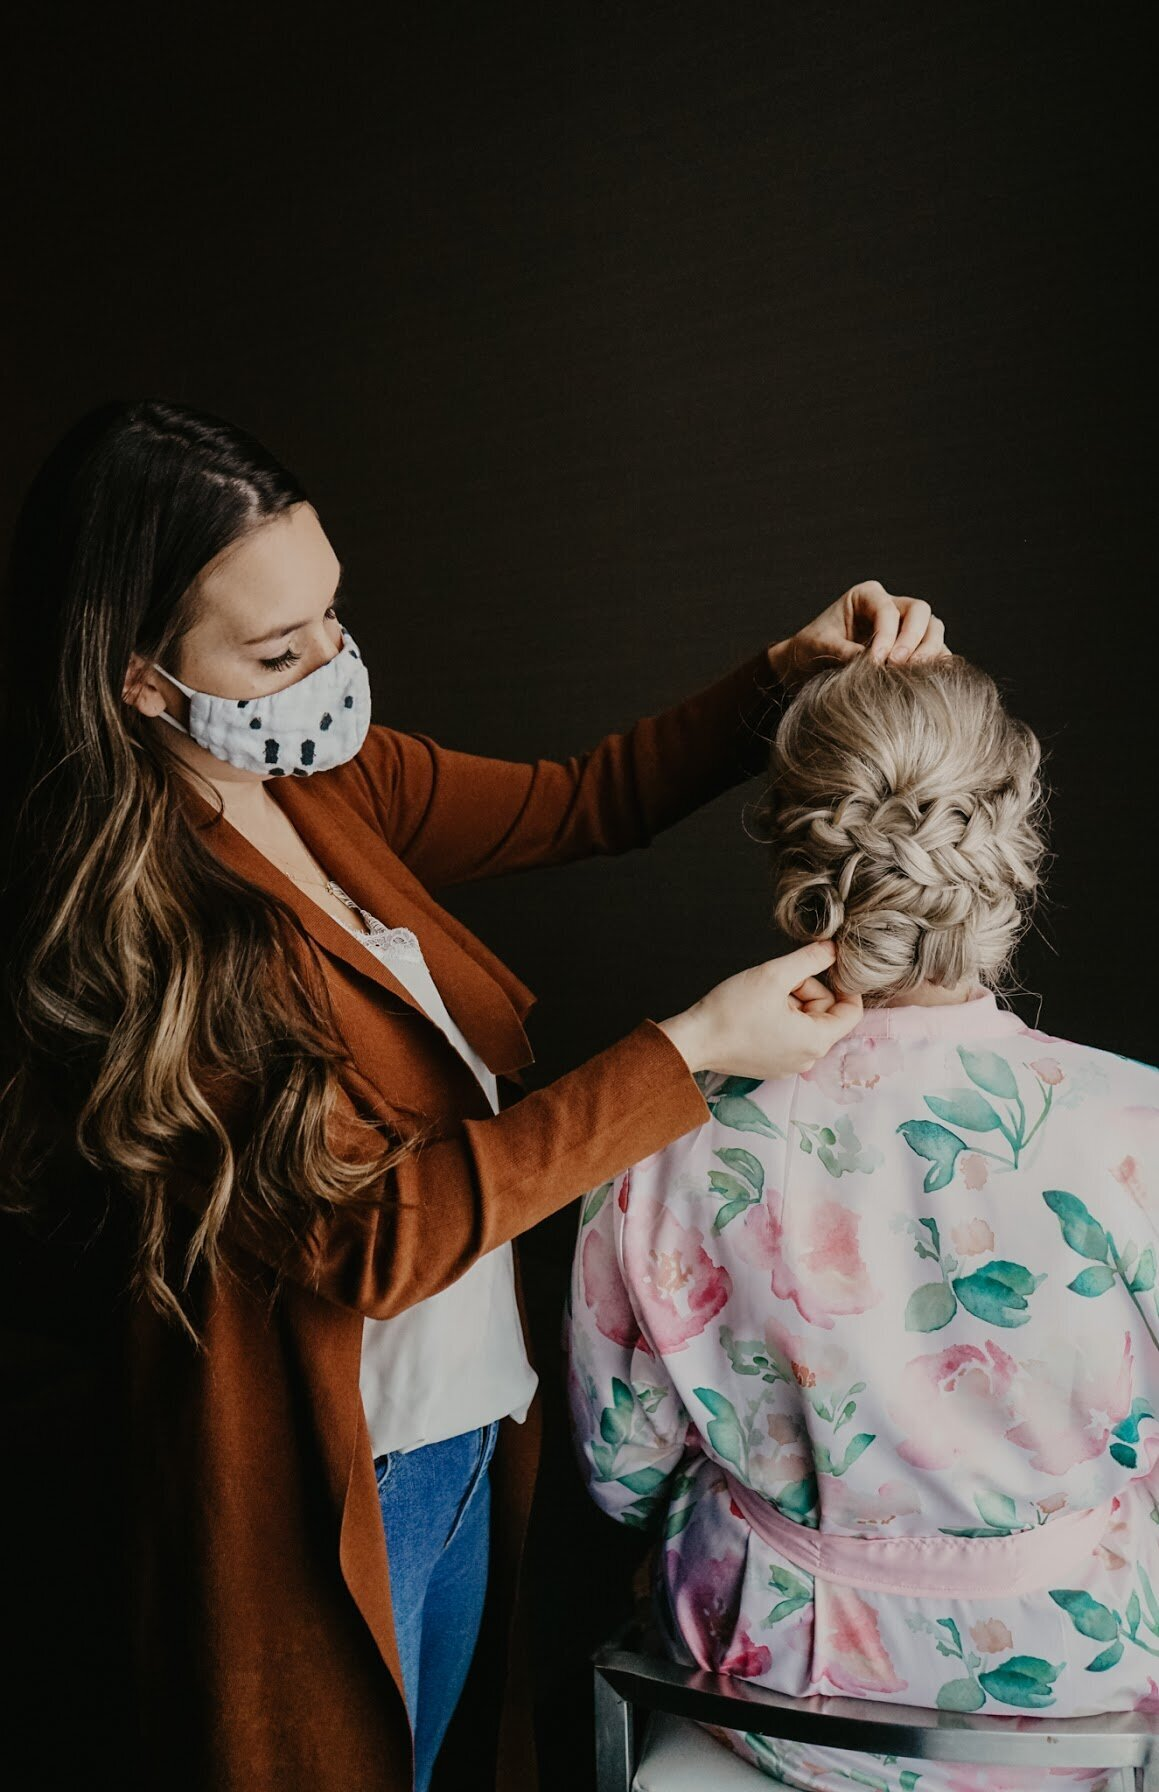 Kamloops Kelowna Hair And Makeup Team Cassidy Watt Artistry Collective